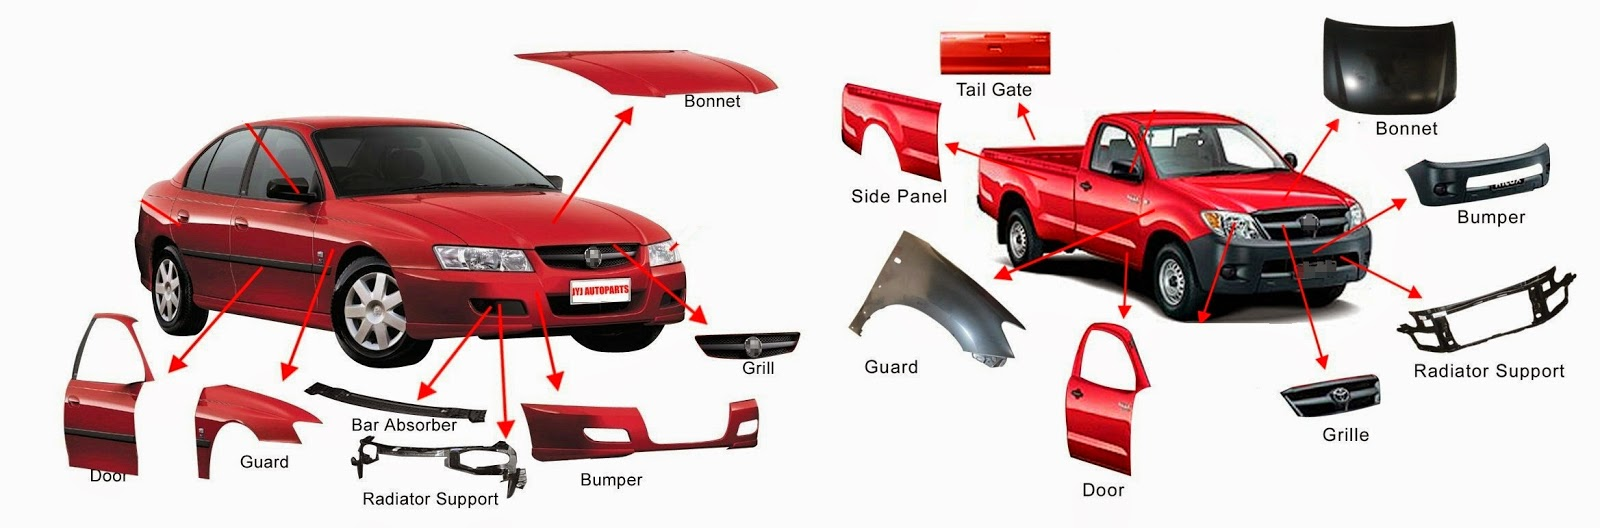 Body Parts Cars Names